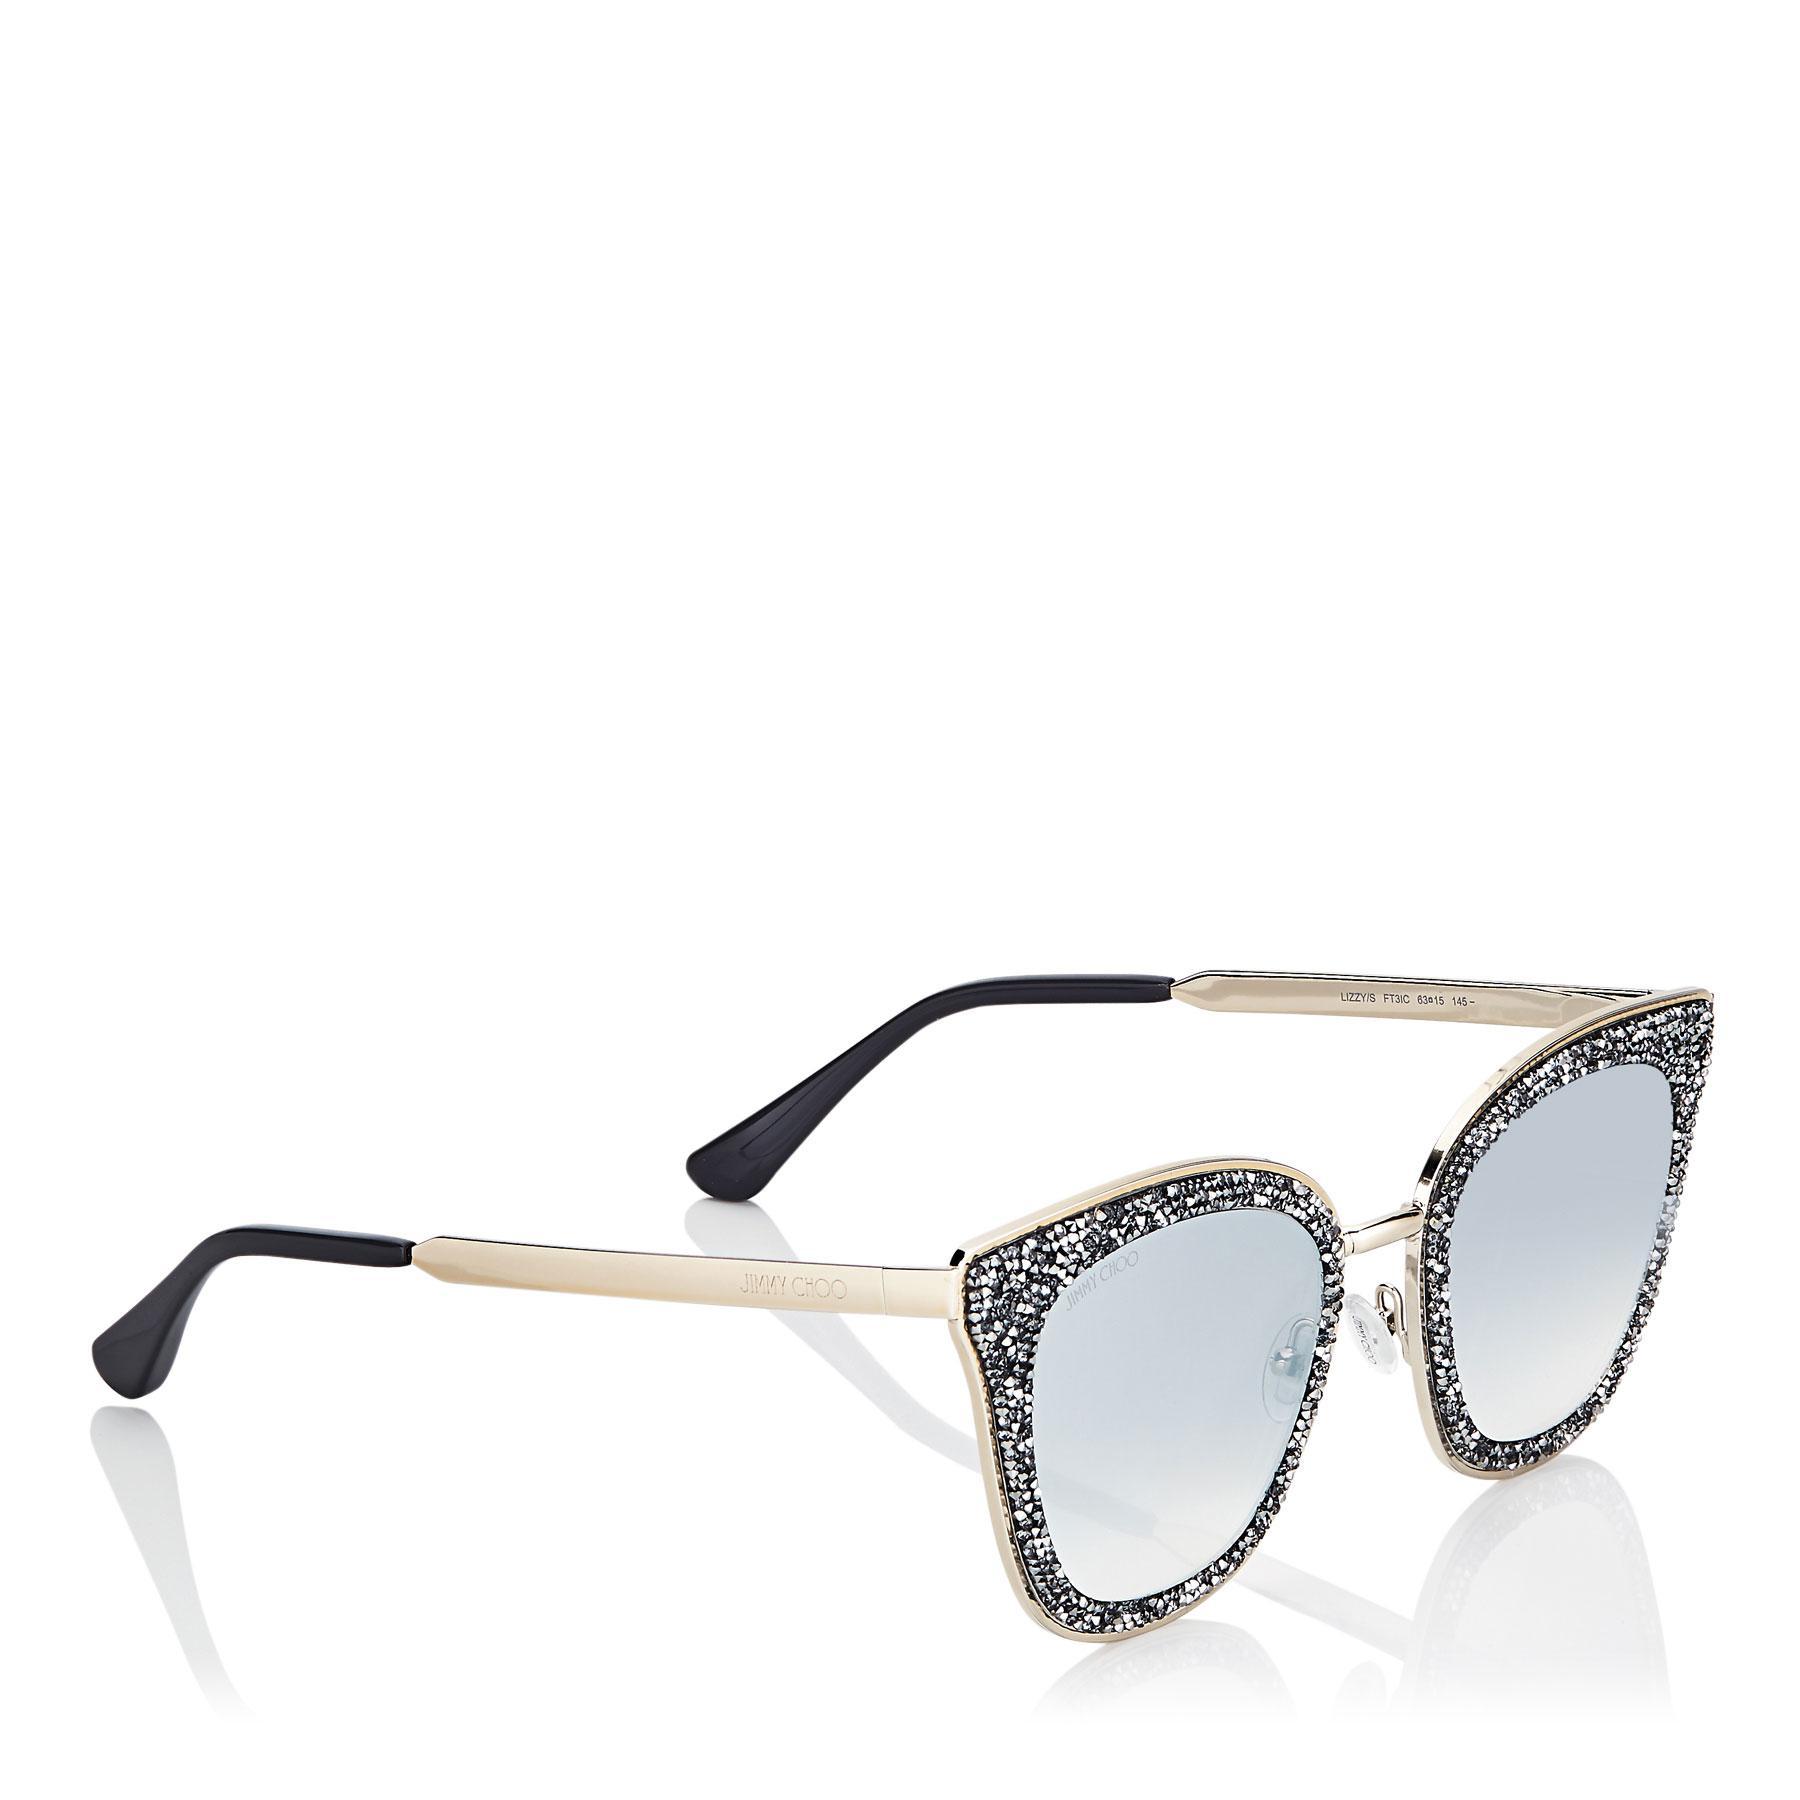 230c3e6c3edc Jimmy Choo - Metallic Lizzy Grey And Silver Cat-eye Sunglasses With Crystal  Detailing -. View fullscreen